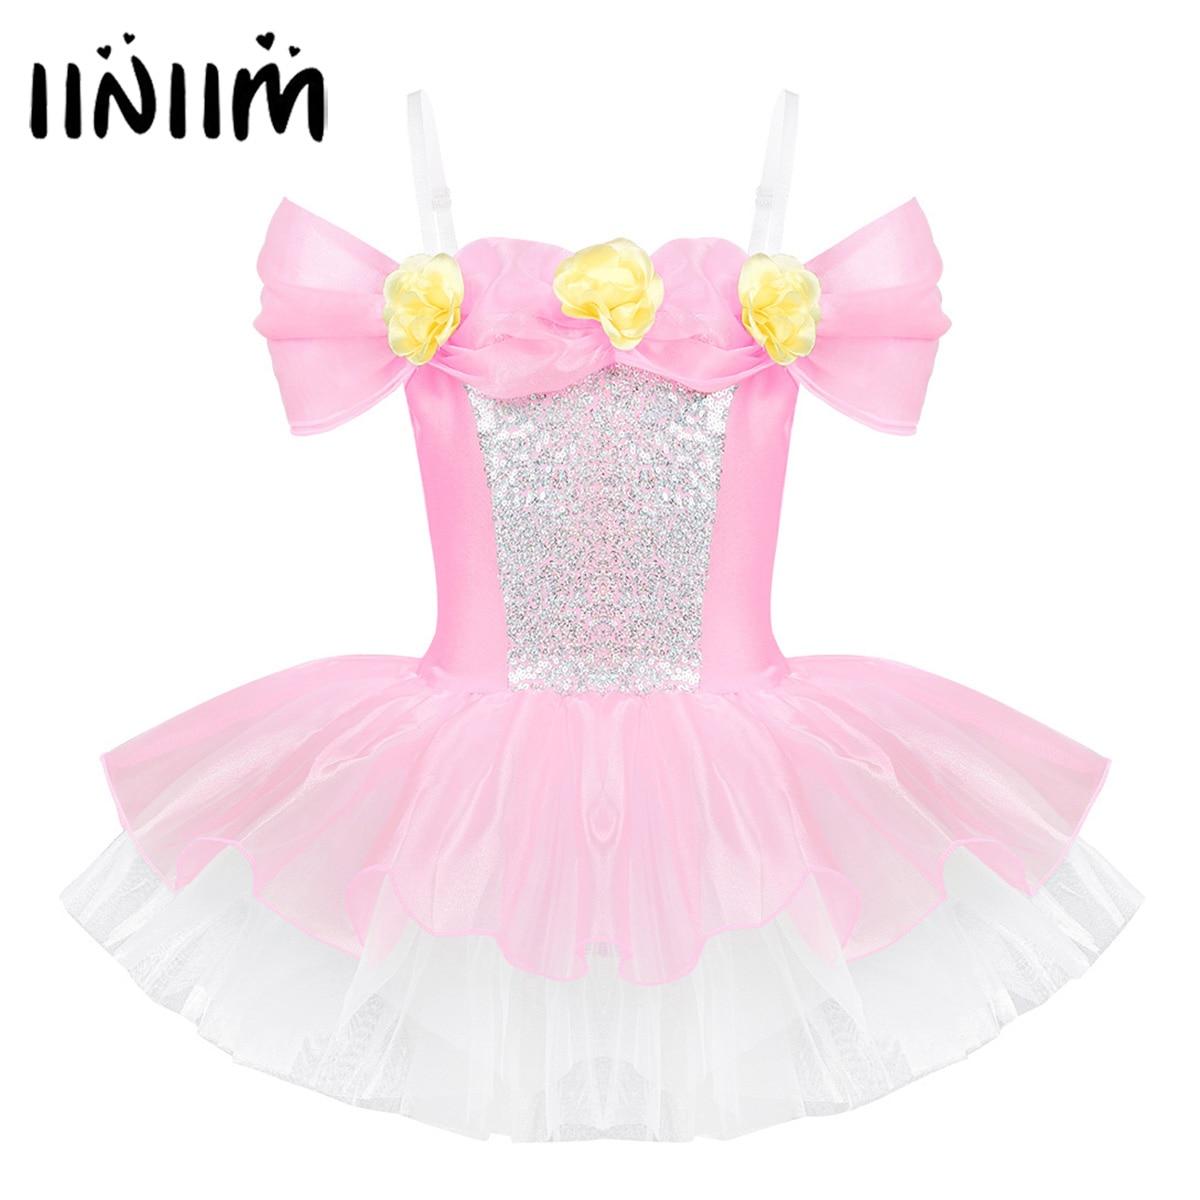 iiniim Kids Ballerina Shoulder Straps Off Shoulder Design 3D Flowers Ballet Dance Wear Gymnastics Leotard Girls Tutu DressBallet   -